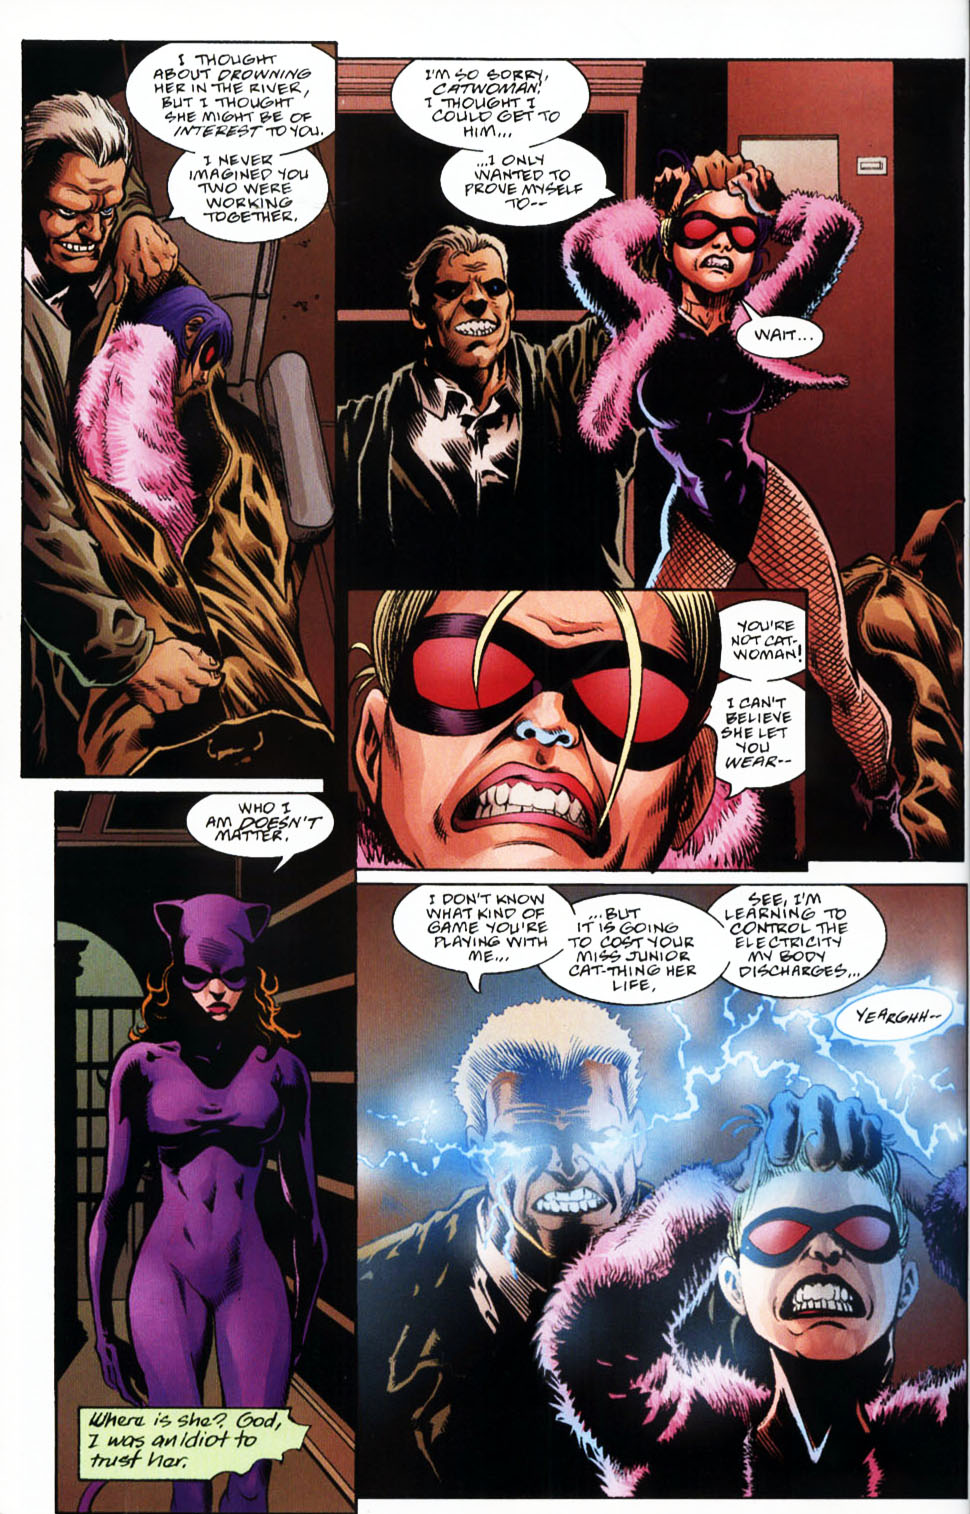 Birds Of Prey - Batgirl-Catwoman 1-42 RyderBurnham ValLewton.jpg